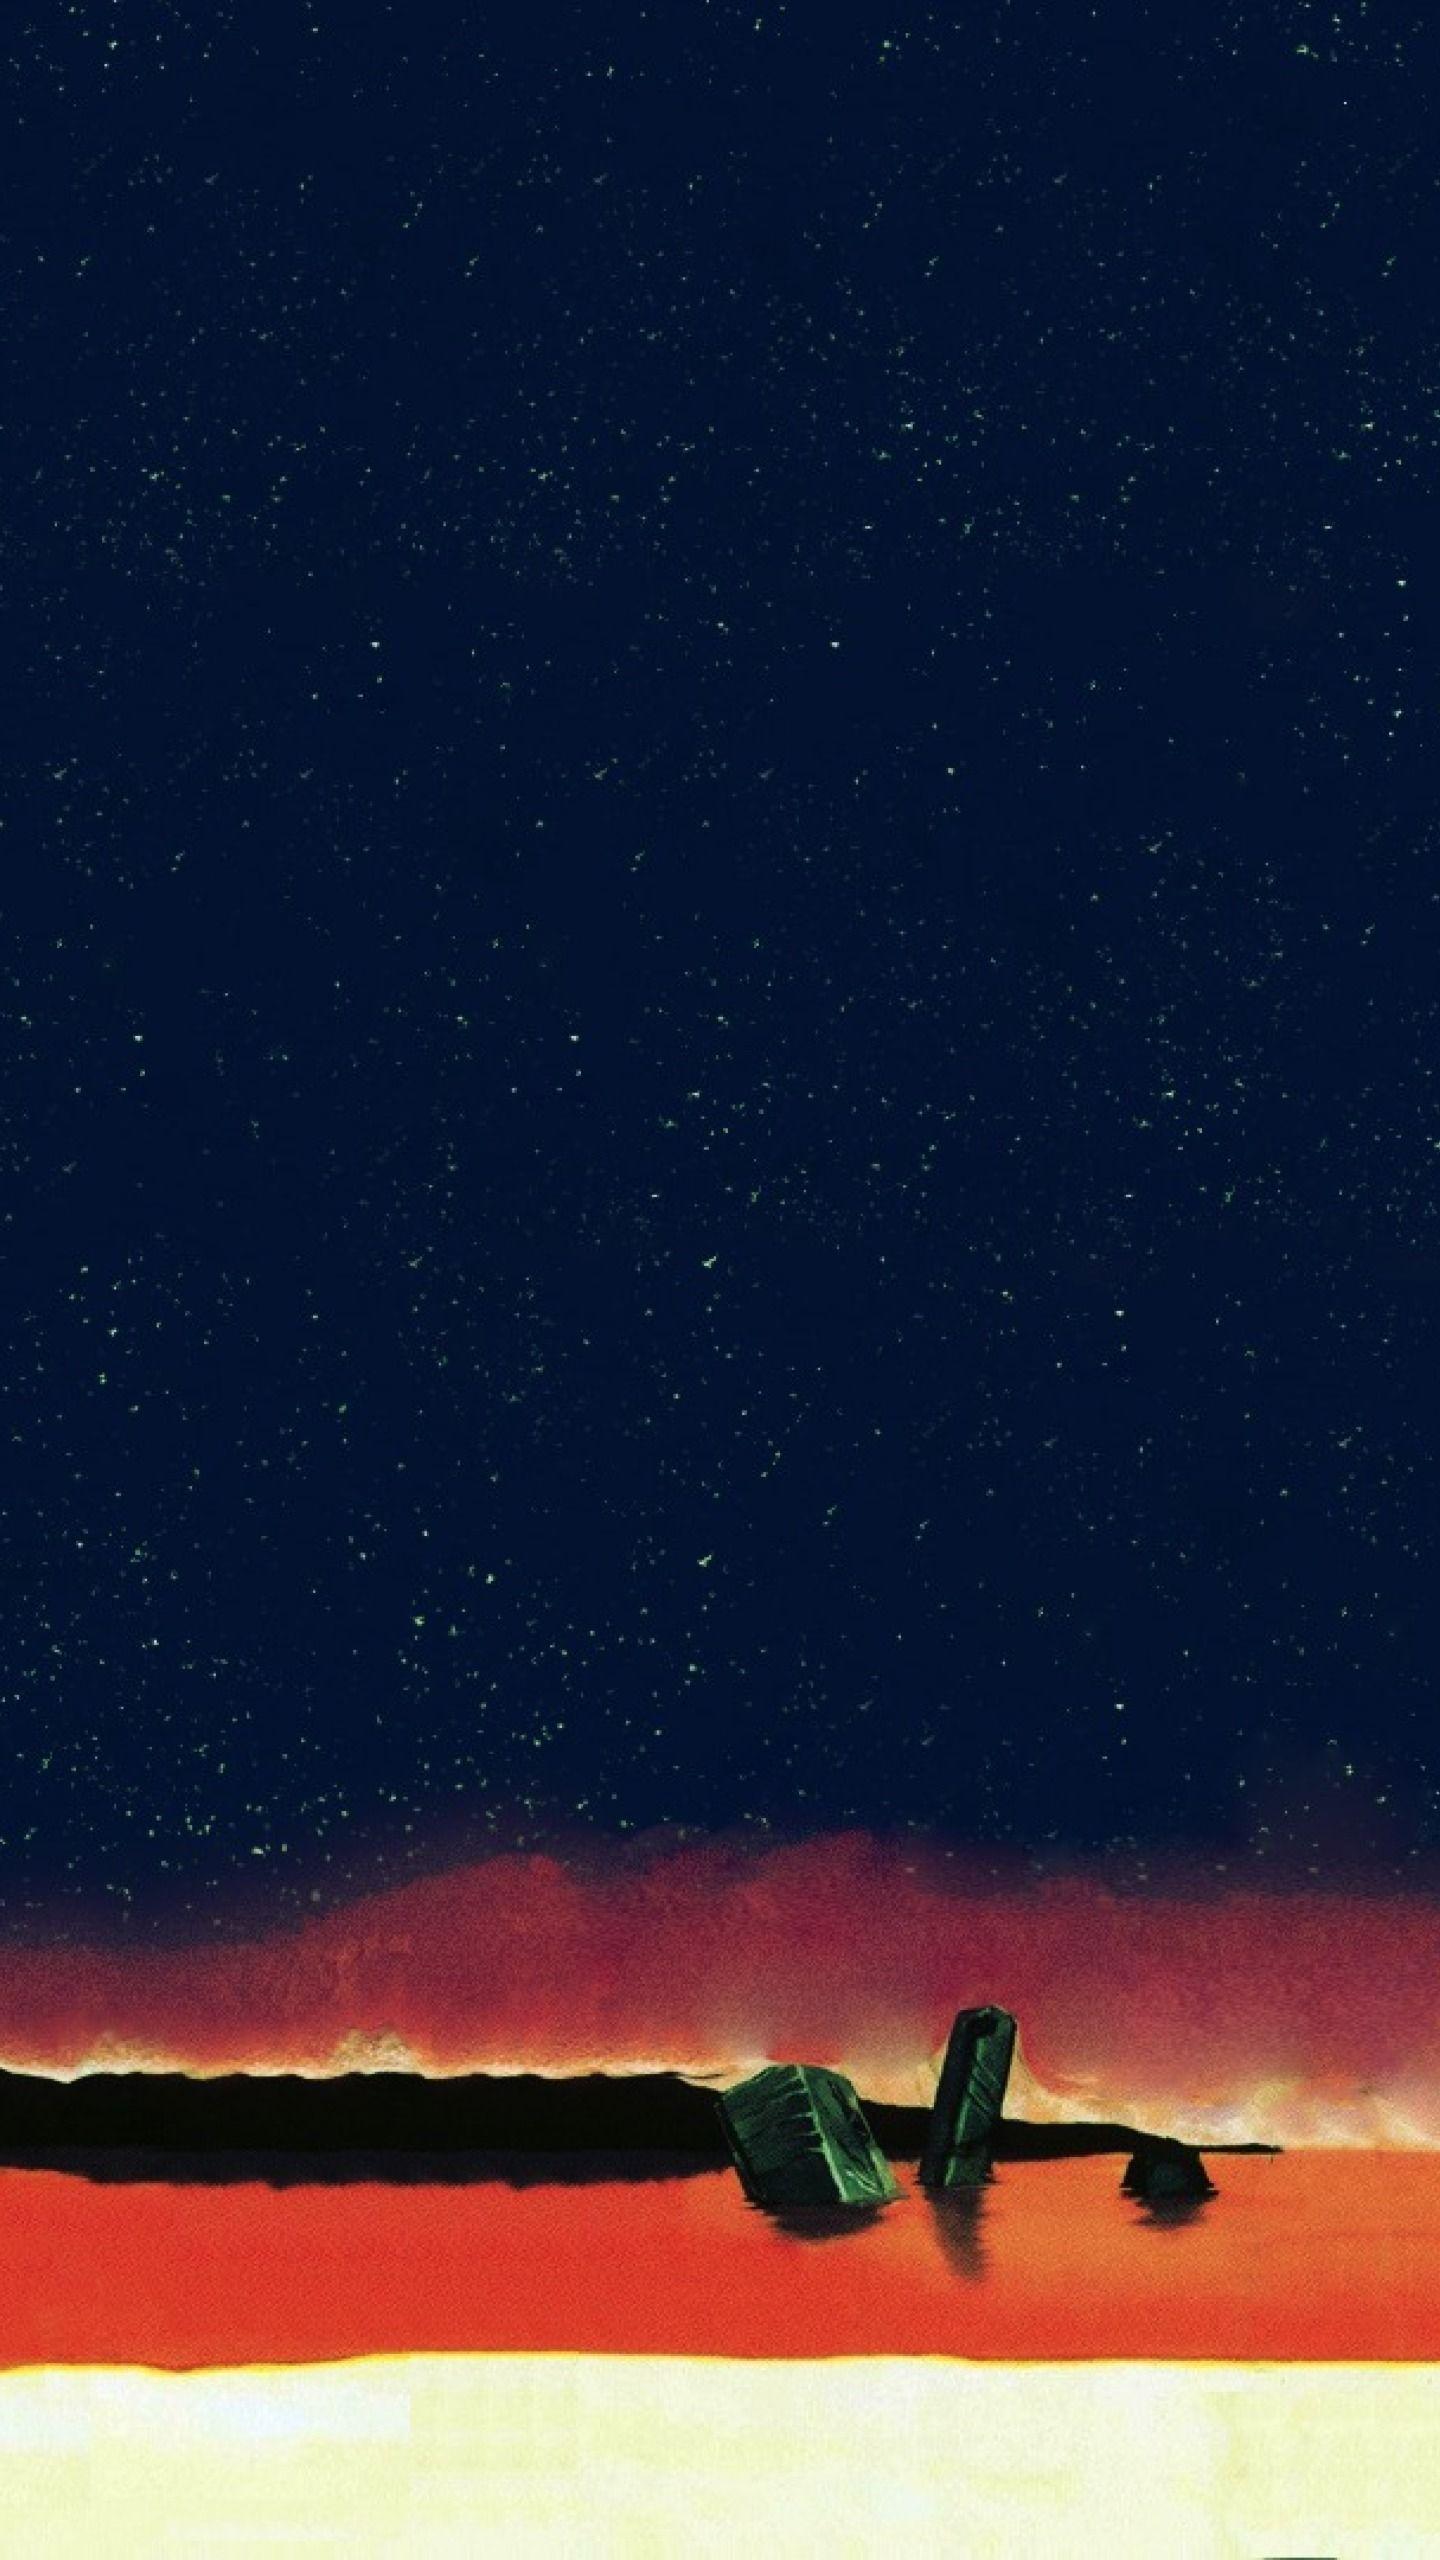 11 Original Evangelion Iphone Wallpaper To Copy Now In 2020 Evangelion Neon Evangelion Iphone Wallpaper